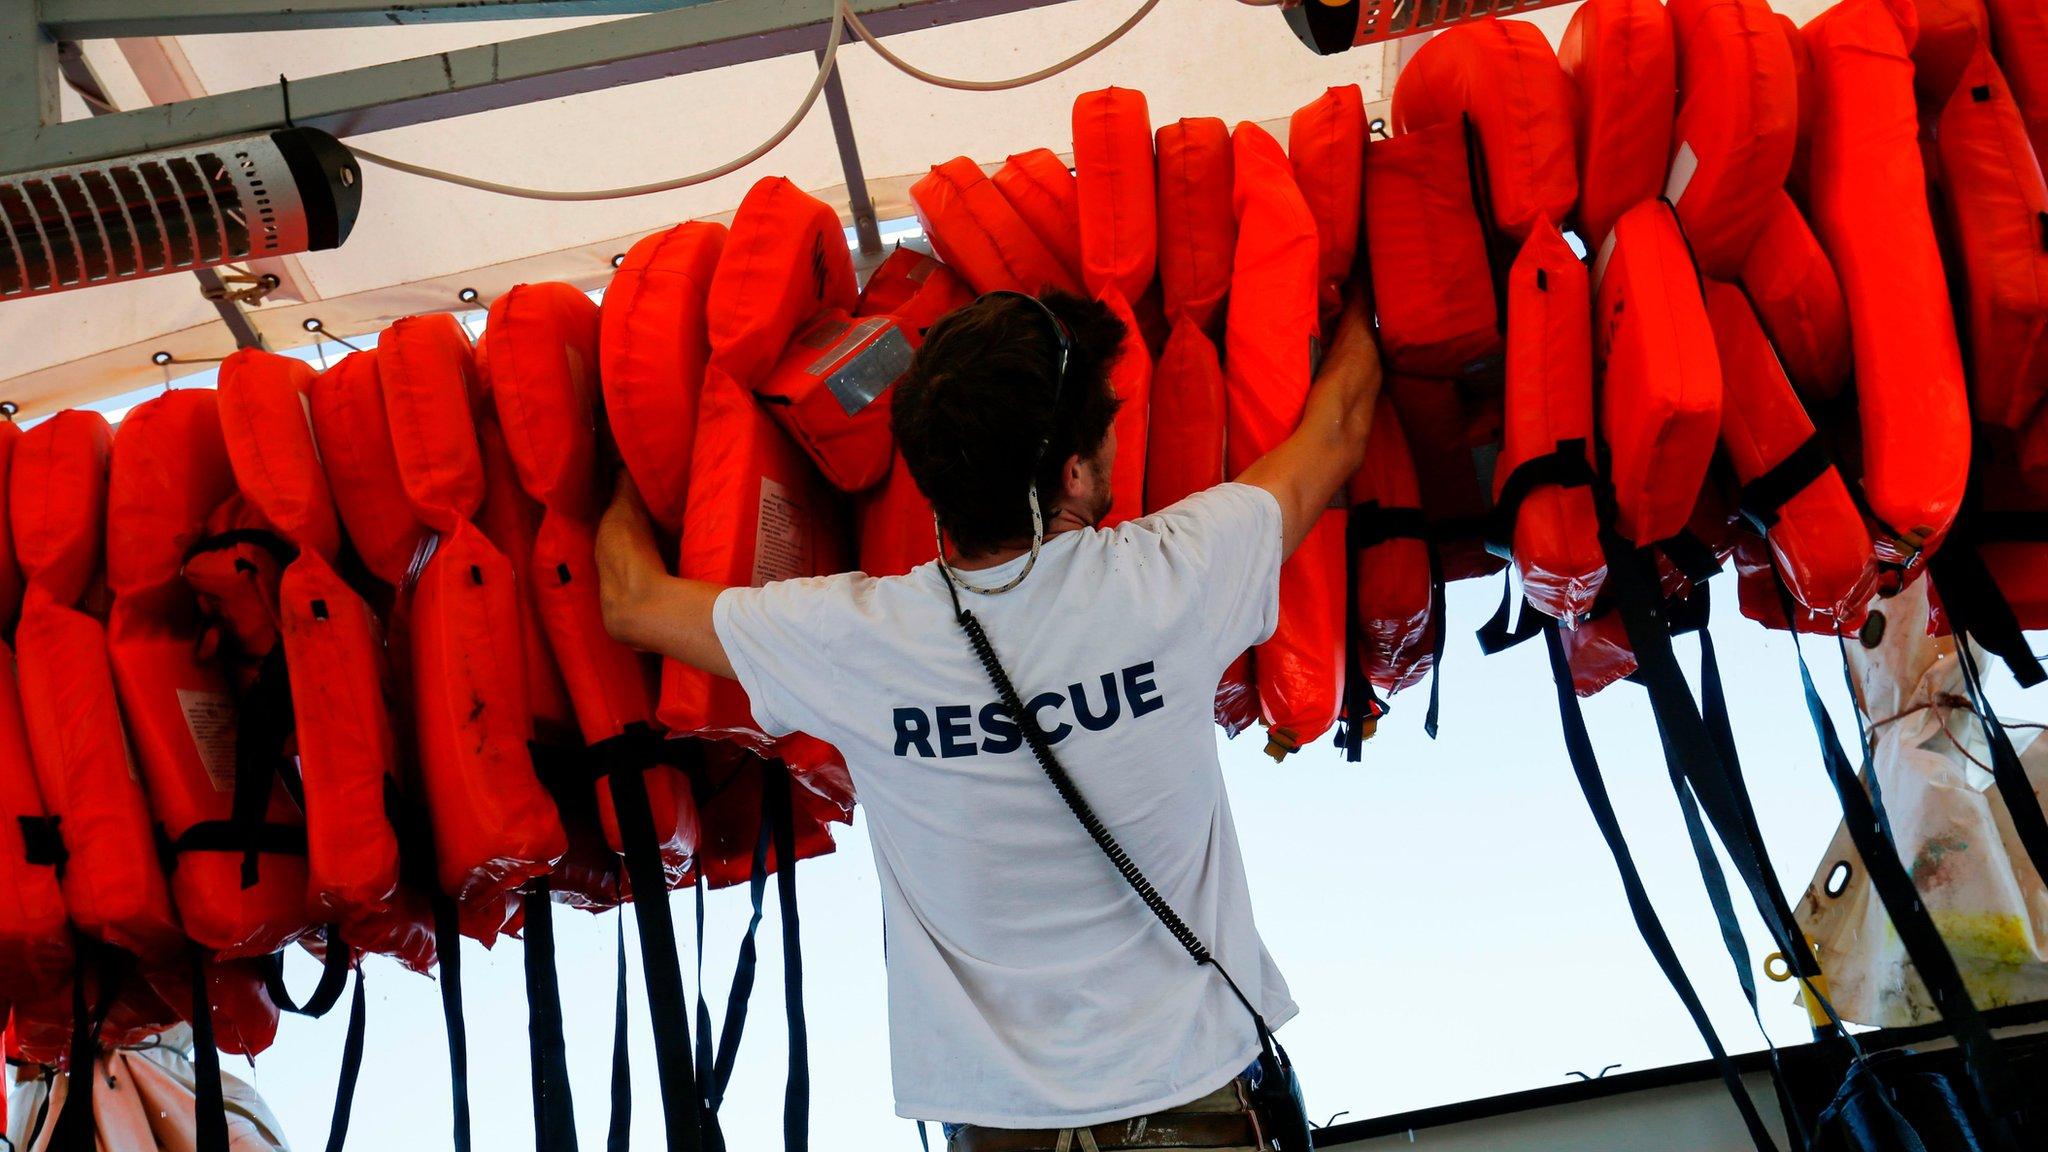 The Aquarius: Migrant taxi service or charitable rescuers?